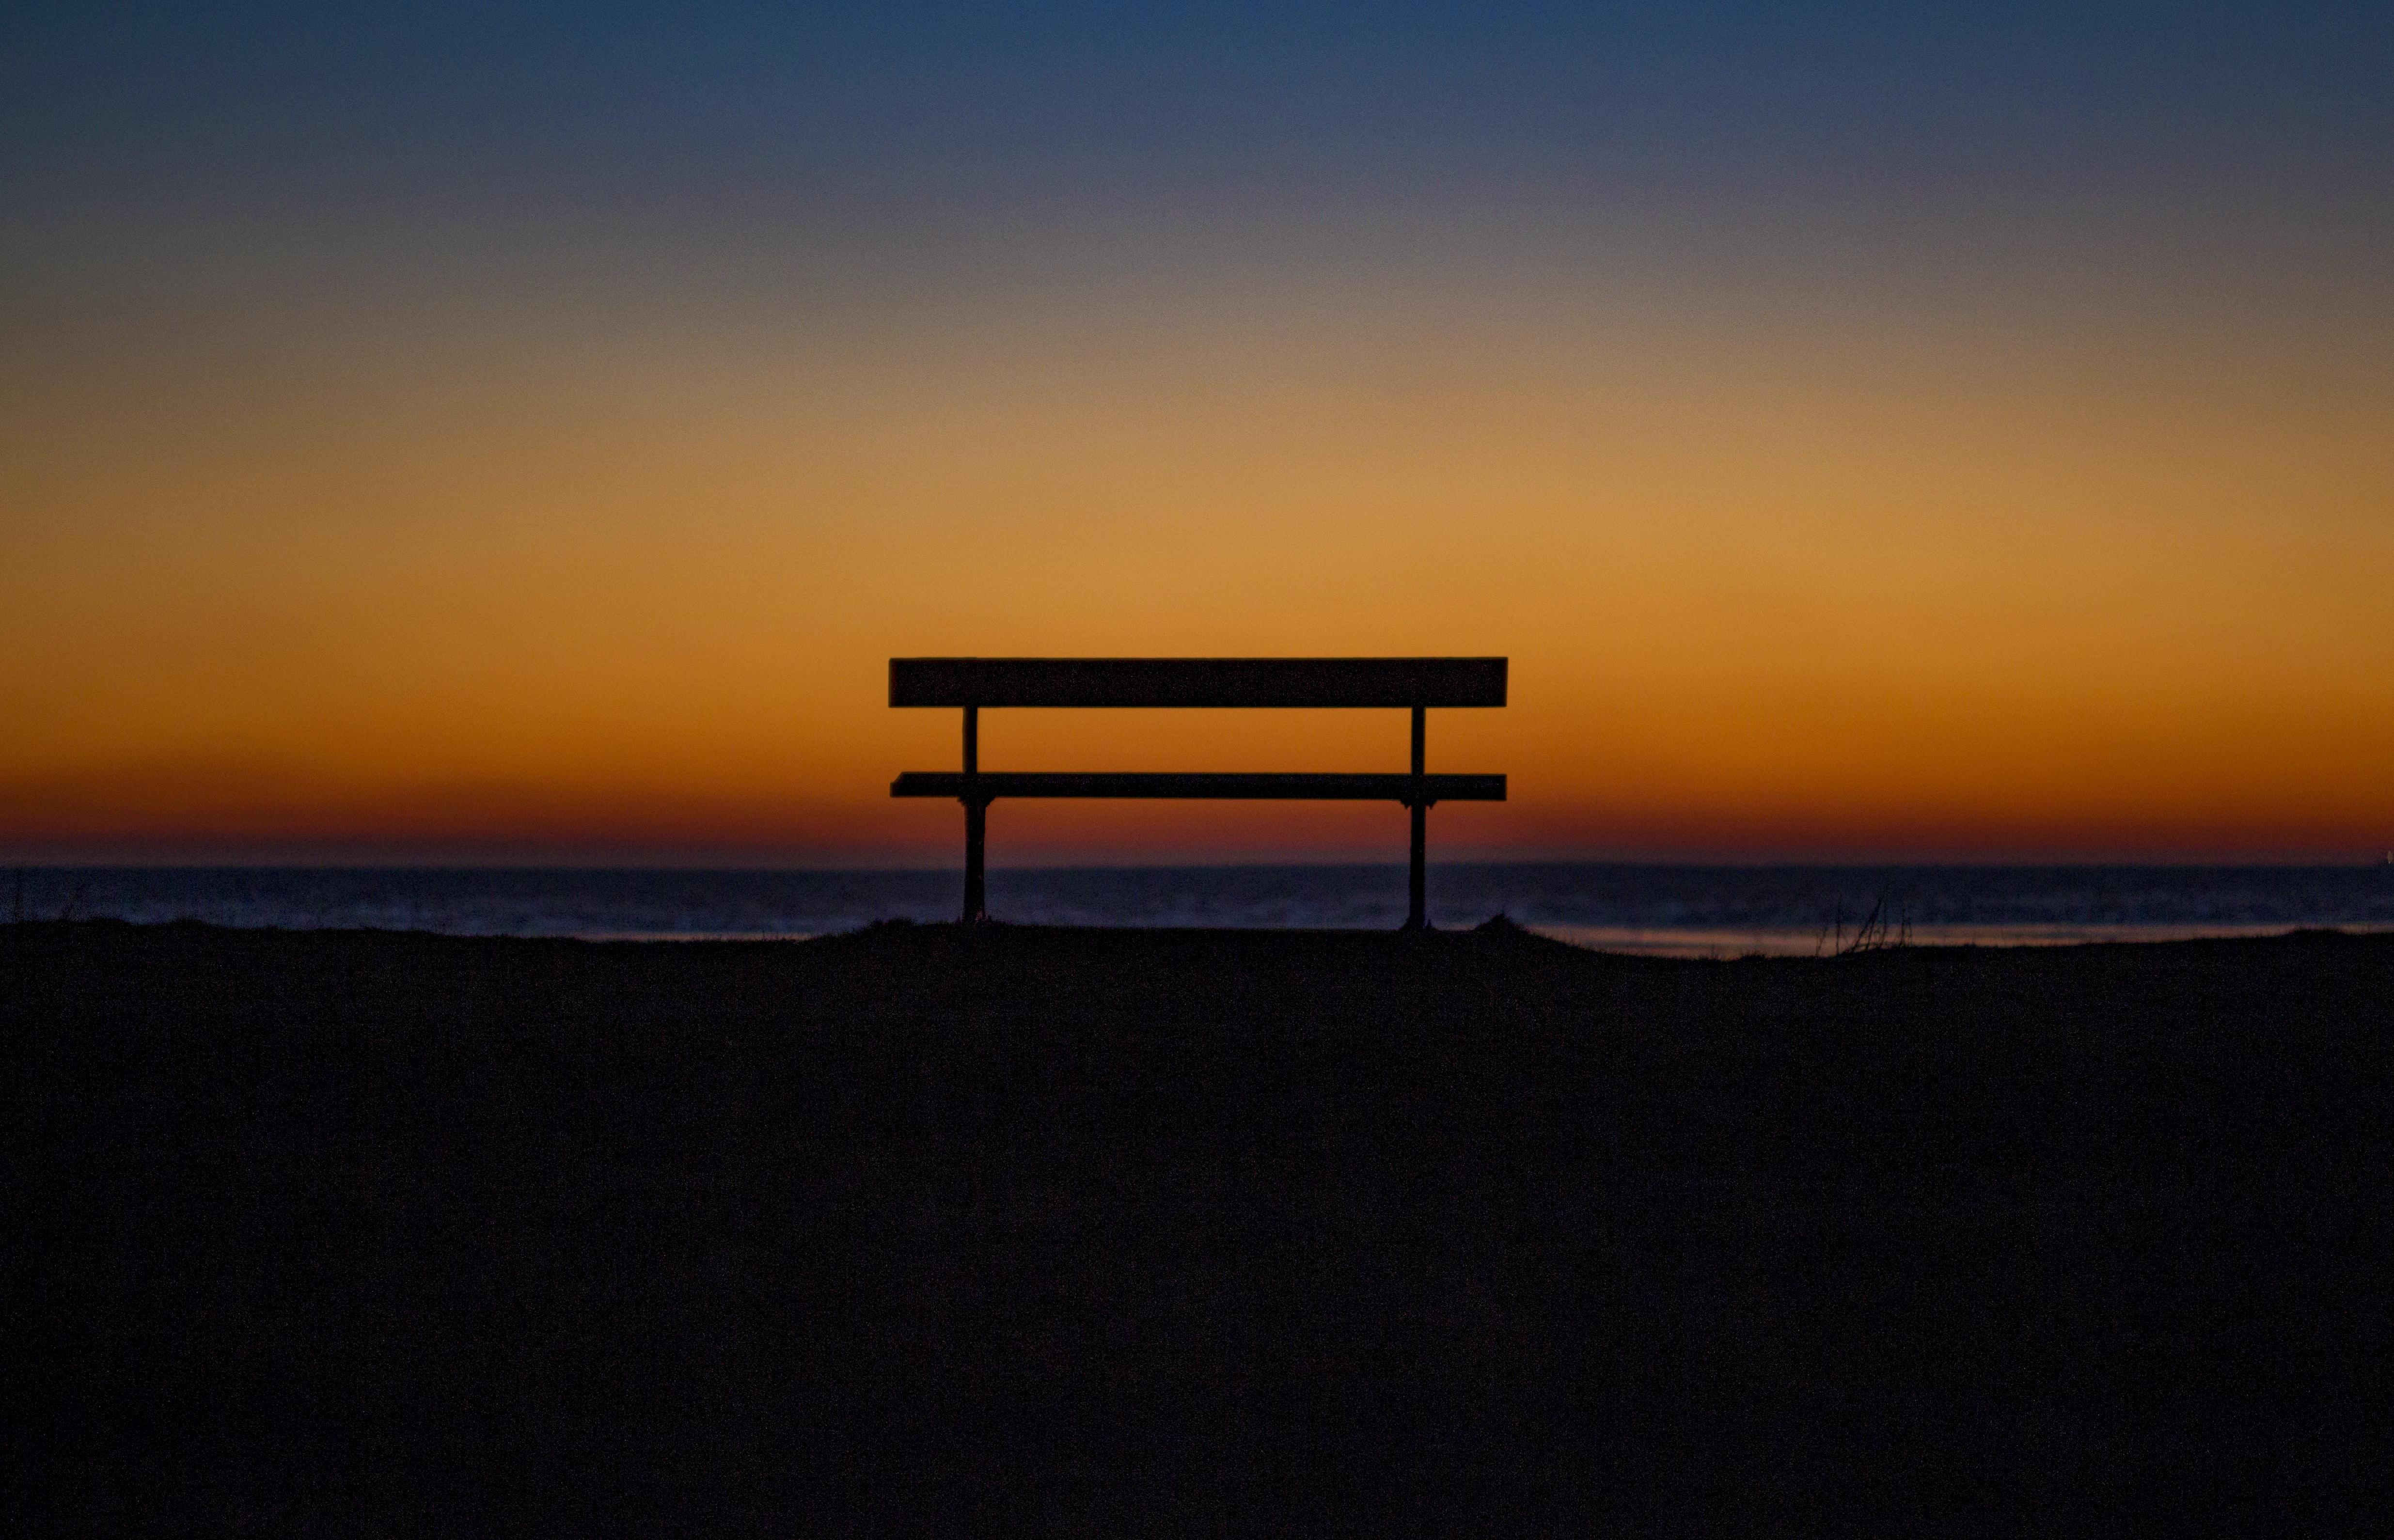 bench near shoreline during sunset